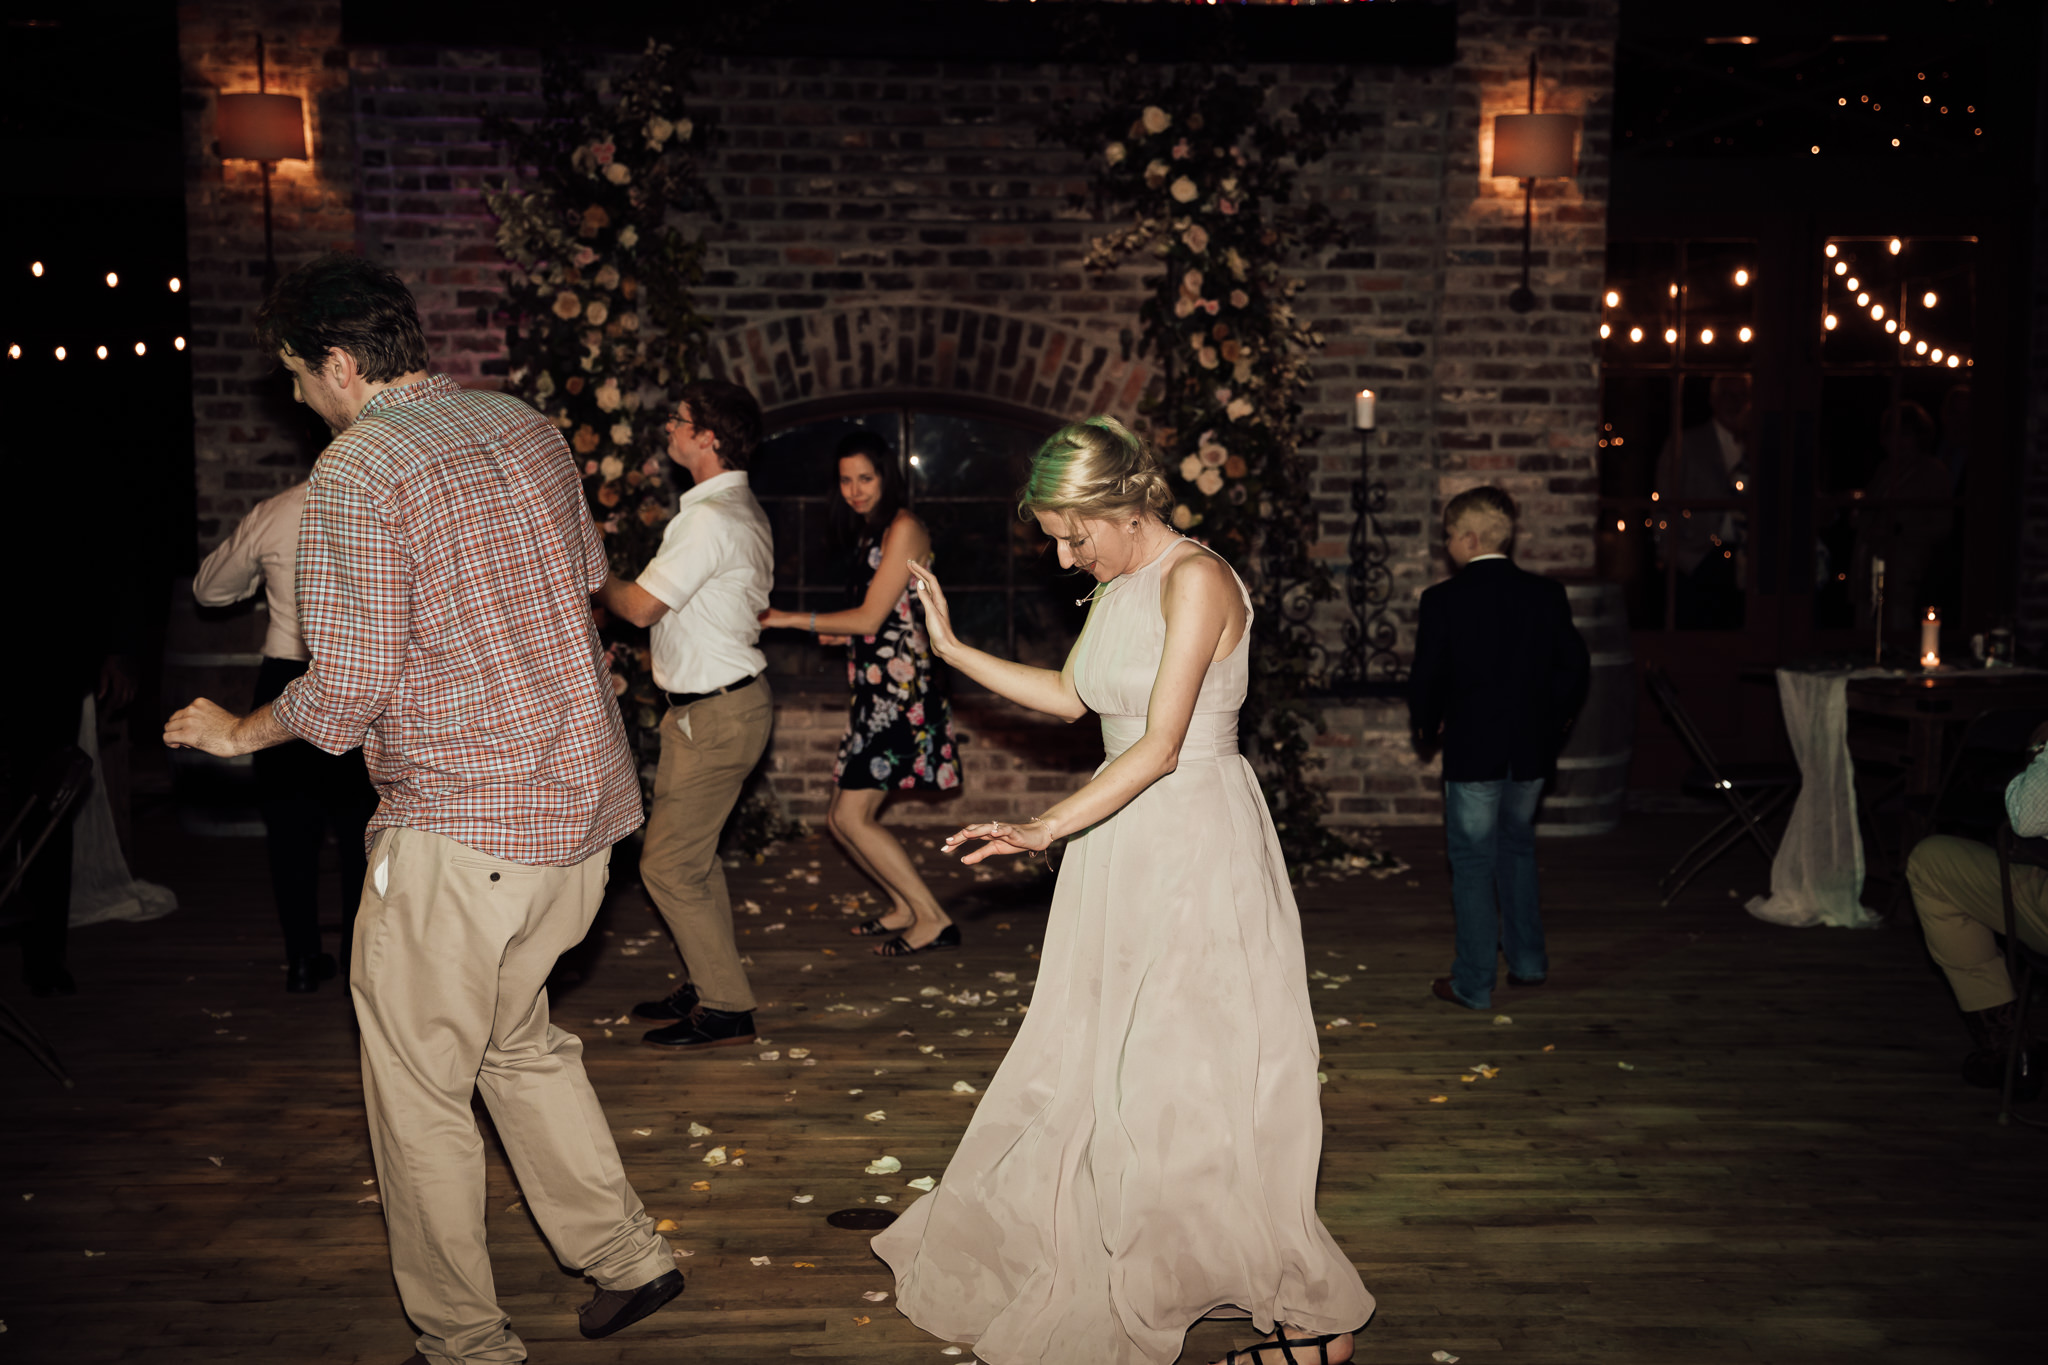 phantom-canyon-brewery-colorado-springs-wedding-photographer-462.jpg